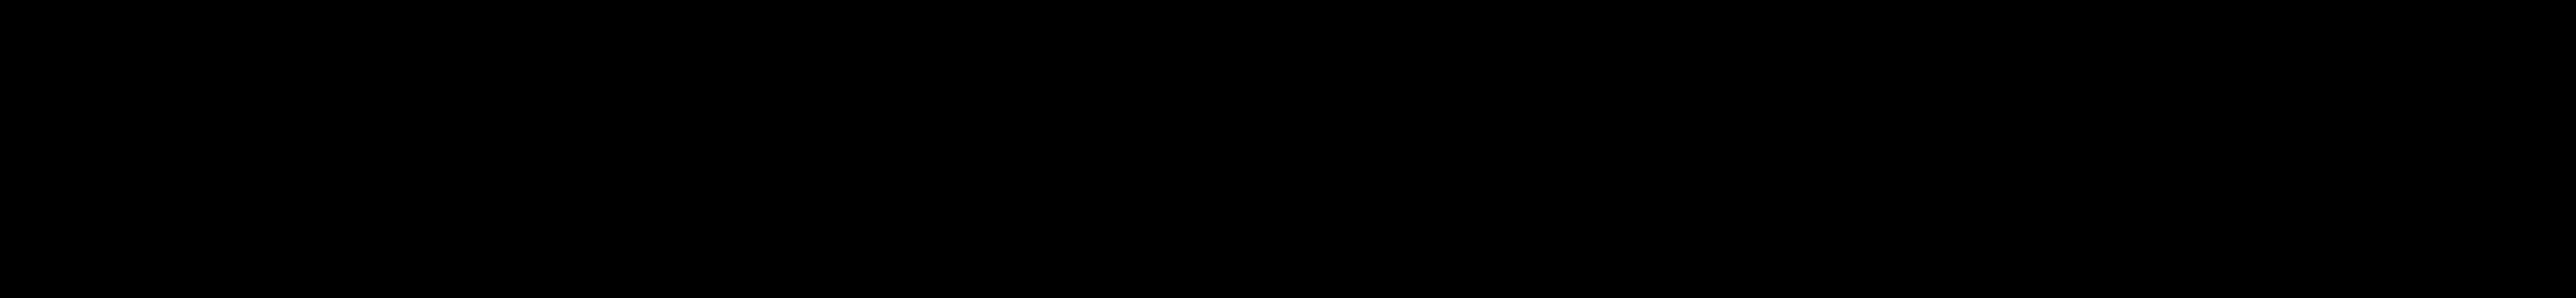 kisscc0-line-form-drawing-visual-arts-cartoon-cygnini-flying-swan-divider-5b74c34fba8629.016943231534378831764.png